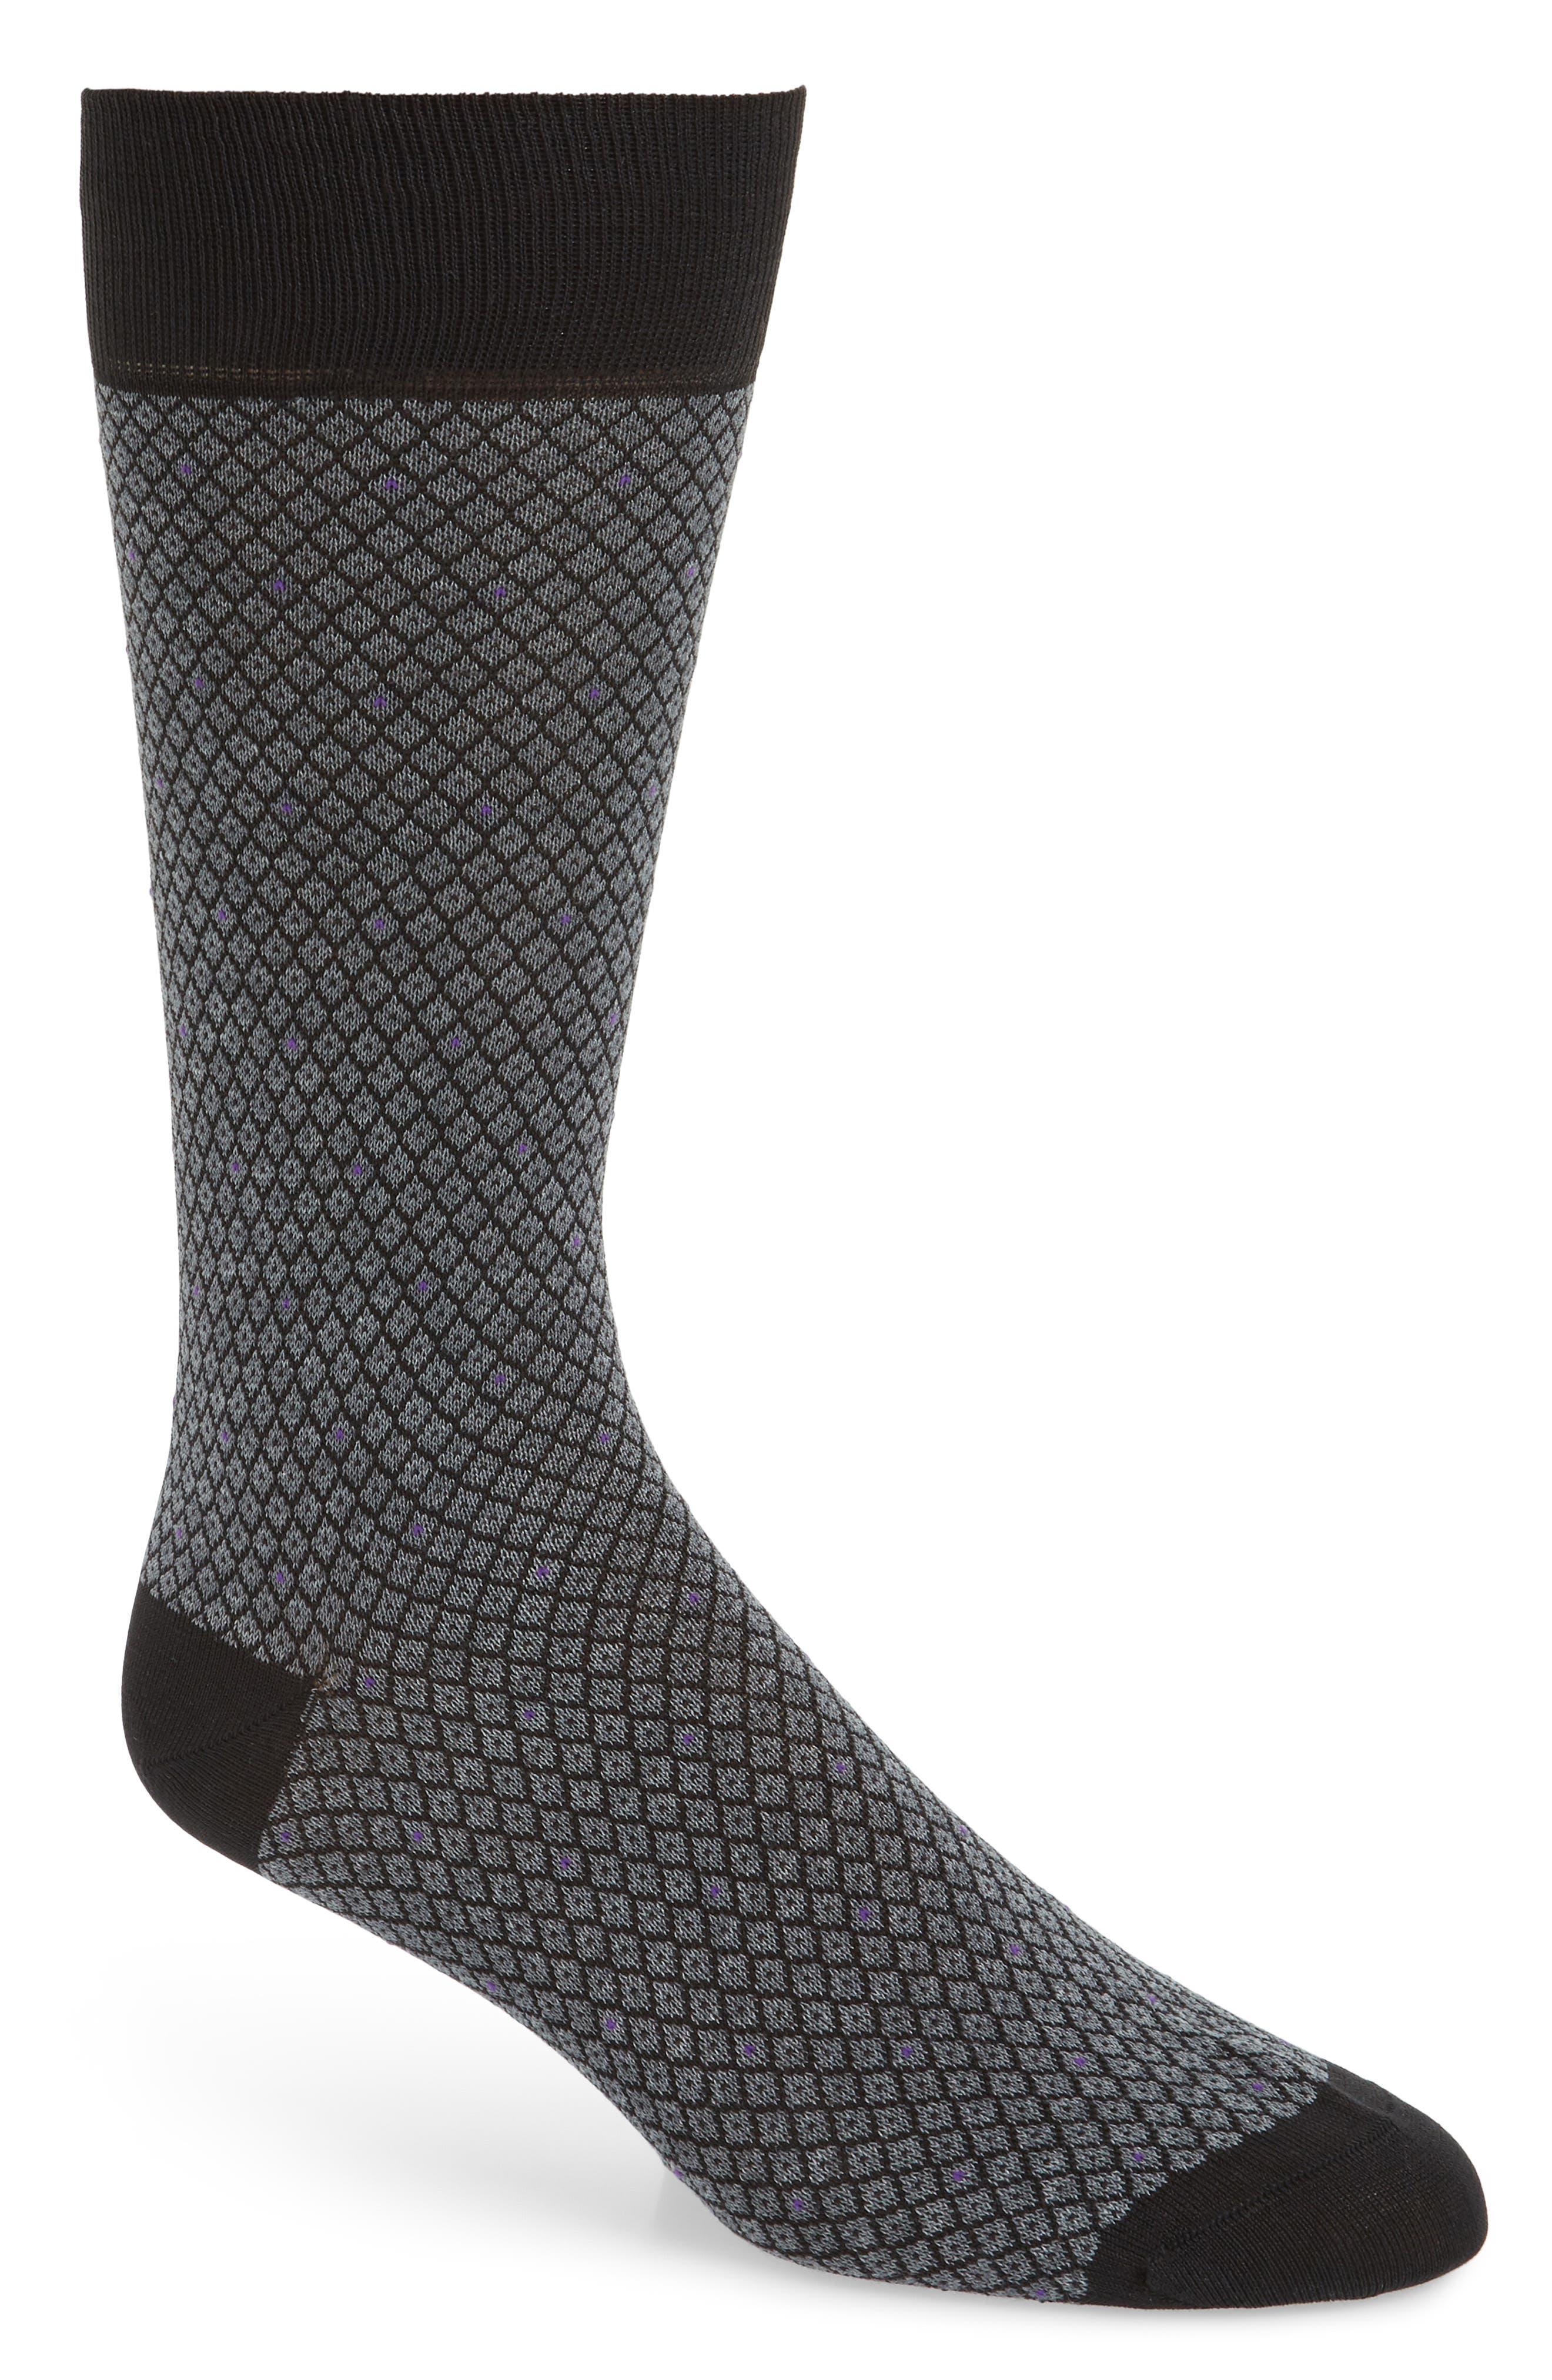 Diamond Jacquard Socks,                         Main,                         color, Charcoal